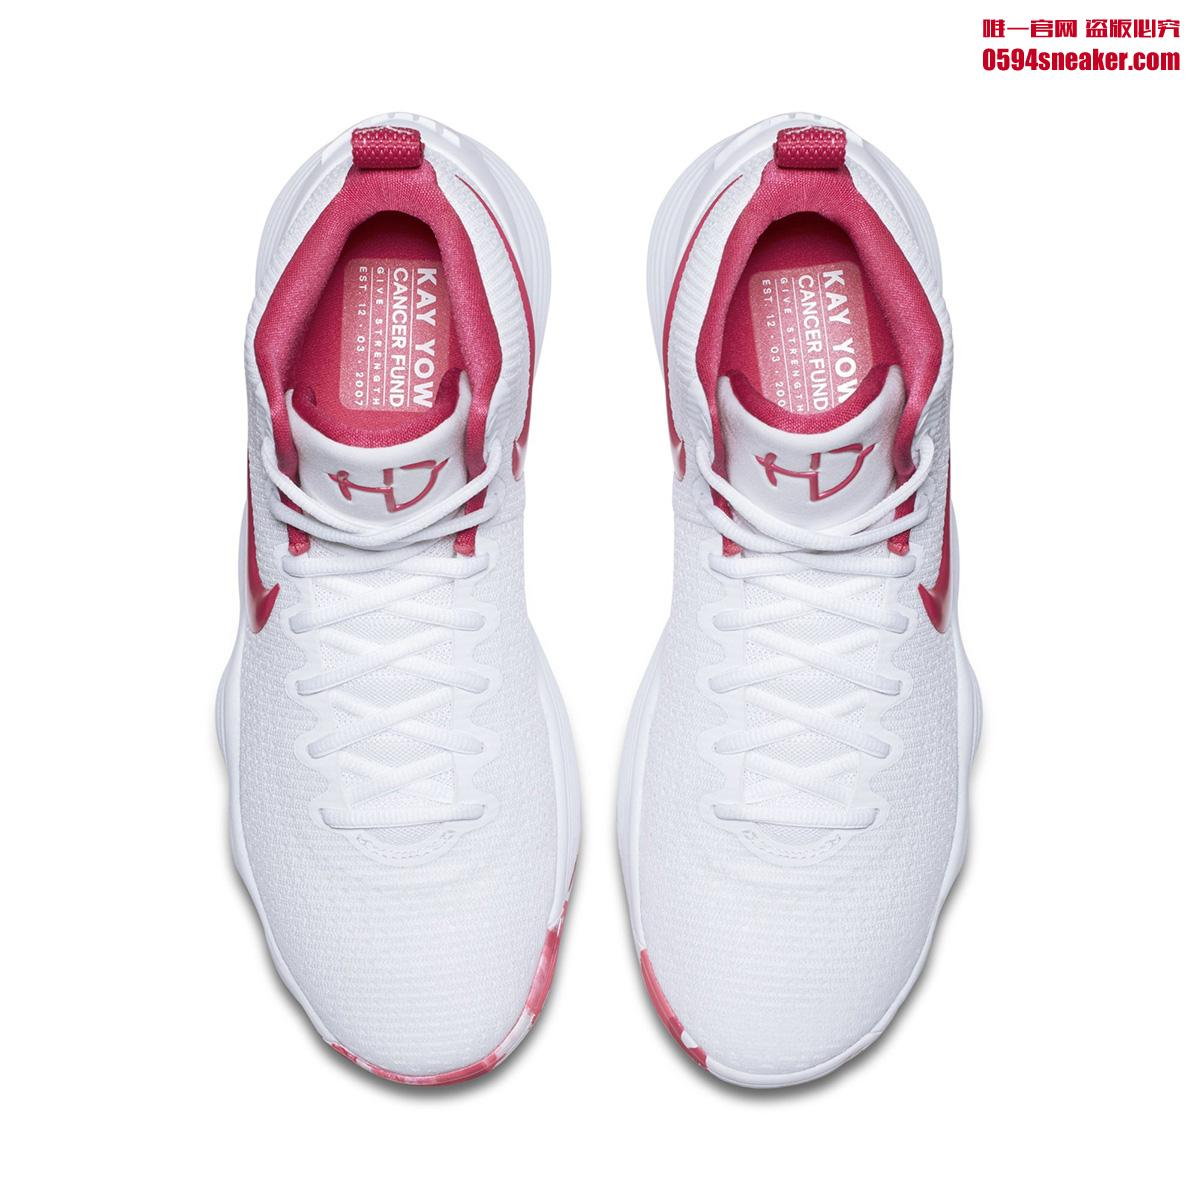 "Hyperdunk 2017,HD2017,Nike  粉丝带加持!抗乳癌配色 Hyperdunk 2017 ""Kay Yow"" 曝光!"